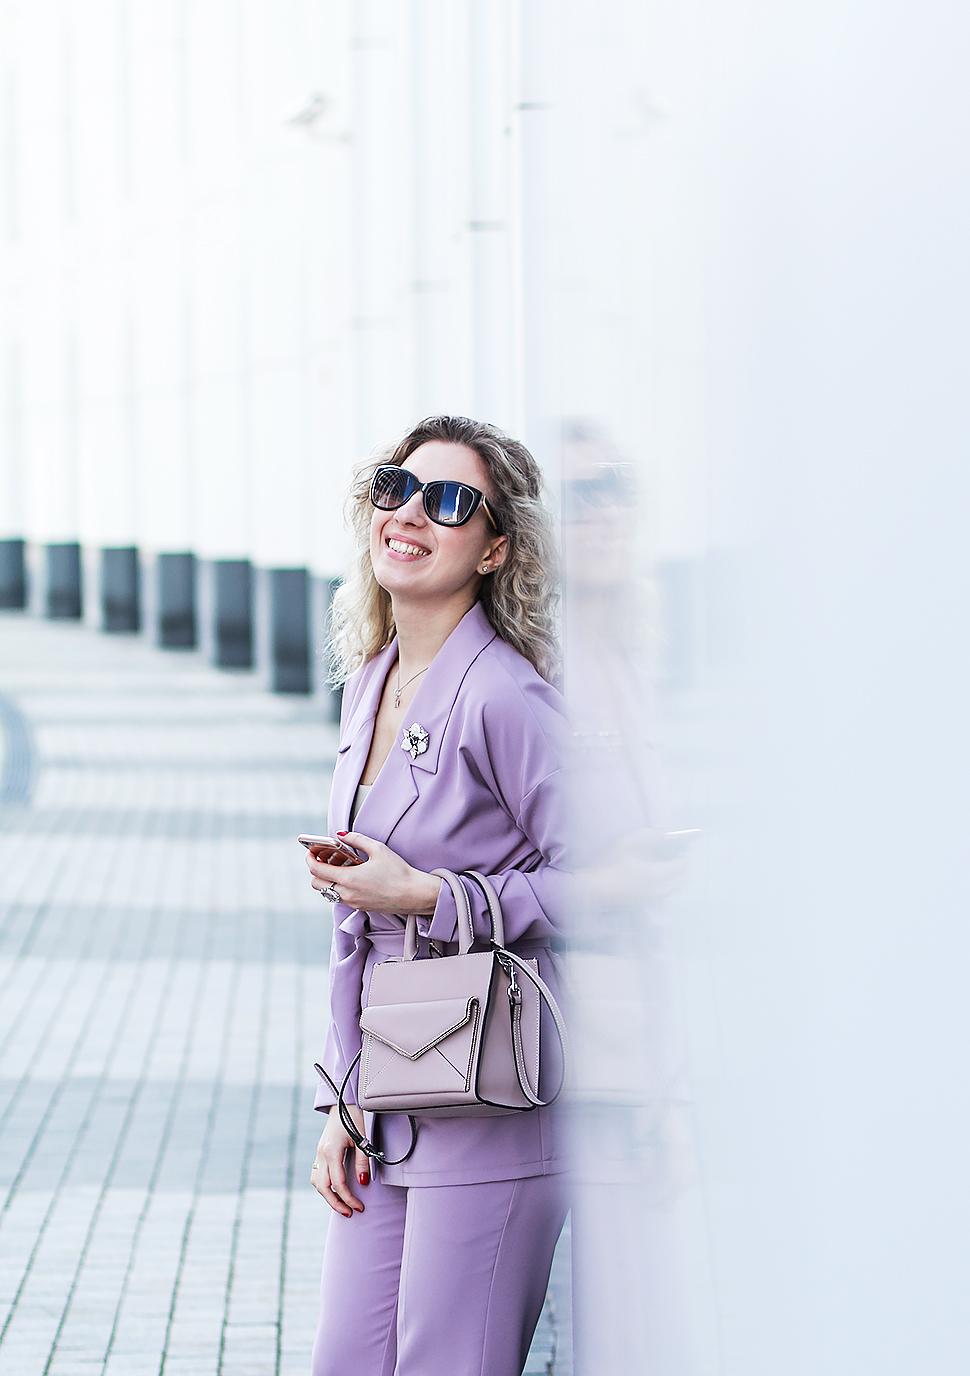 Margarita_Maslova_Ritalifestyle_Fashion_blogger_Moscow_Rebecca_minkoff_bag_violet_lavander_suit_elegant_business_casual_nude_heels5